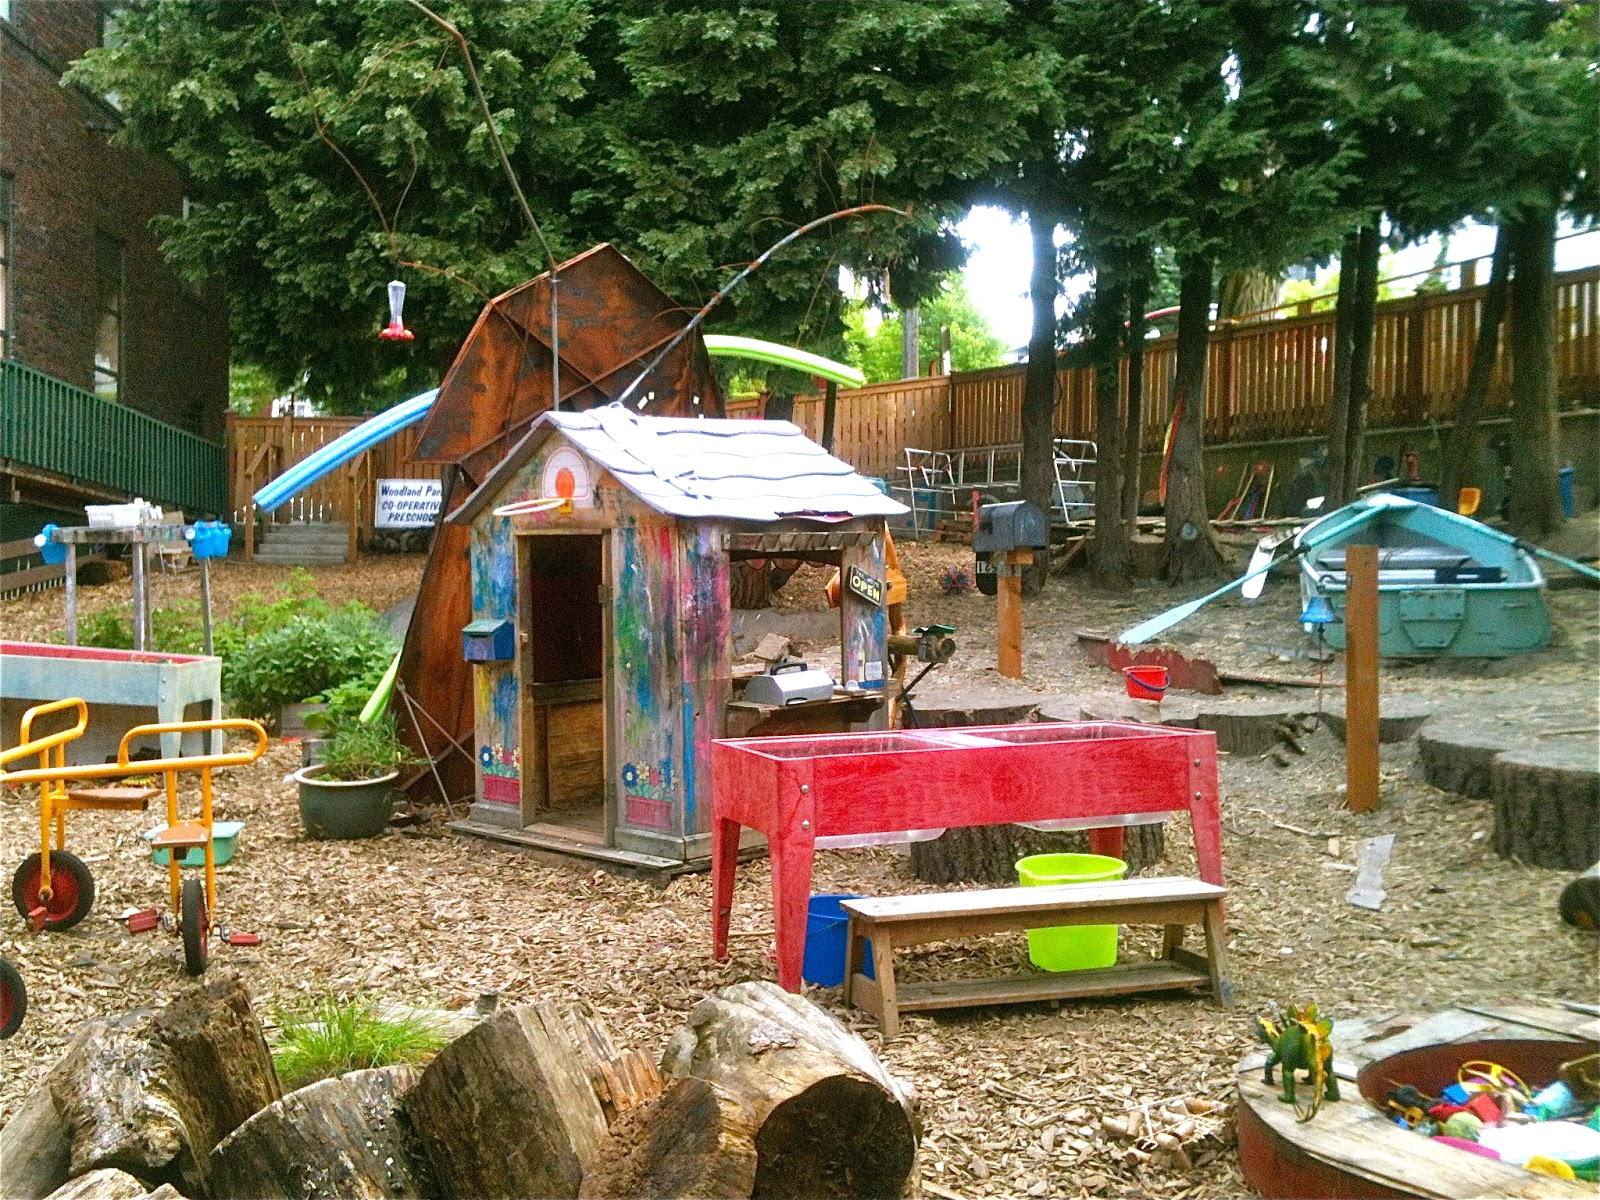 How To Make A Backyard Dog Park